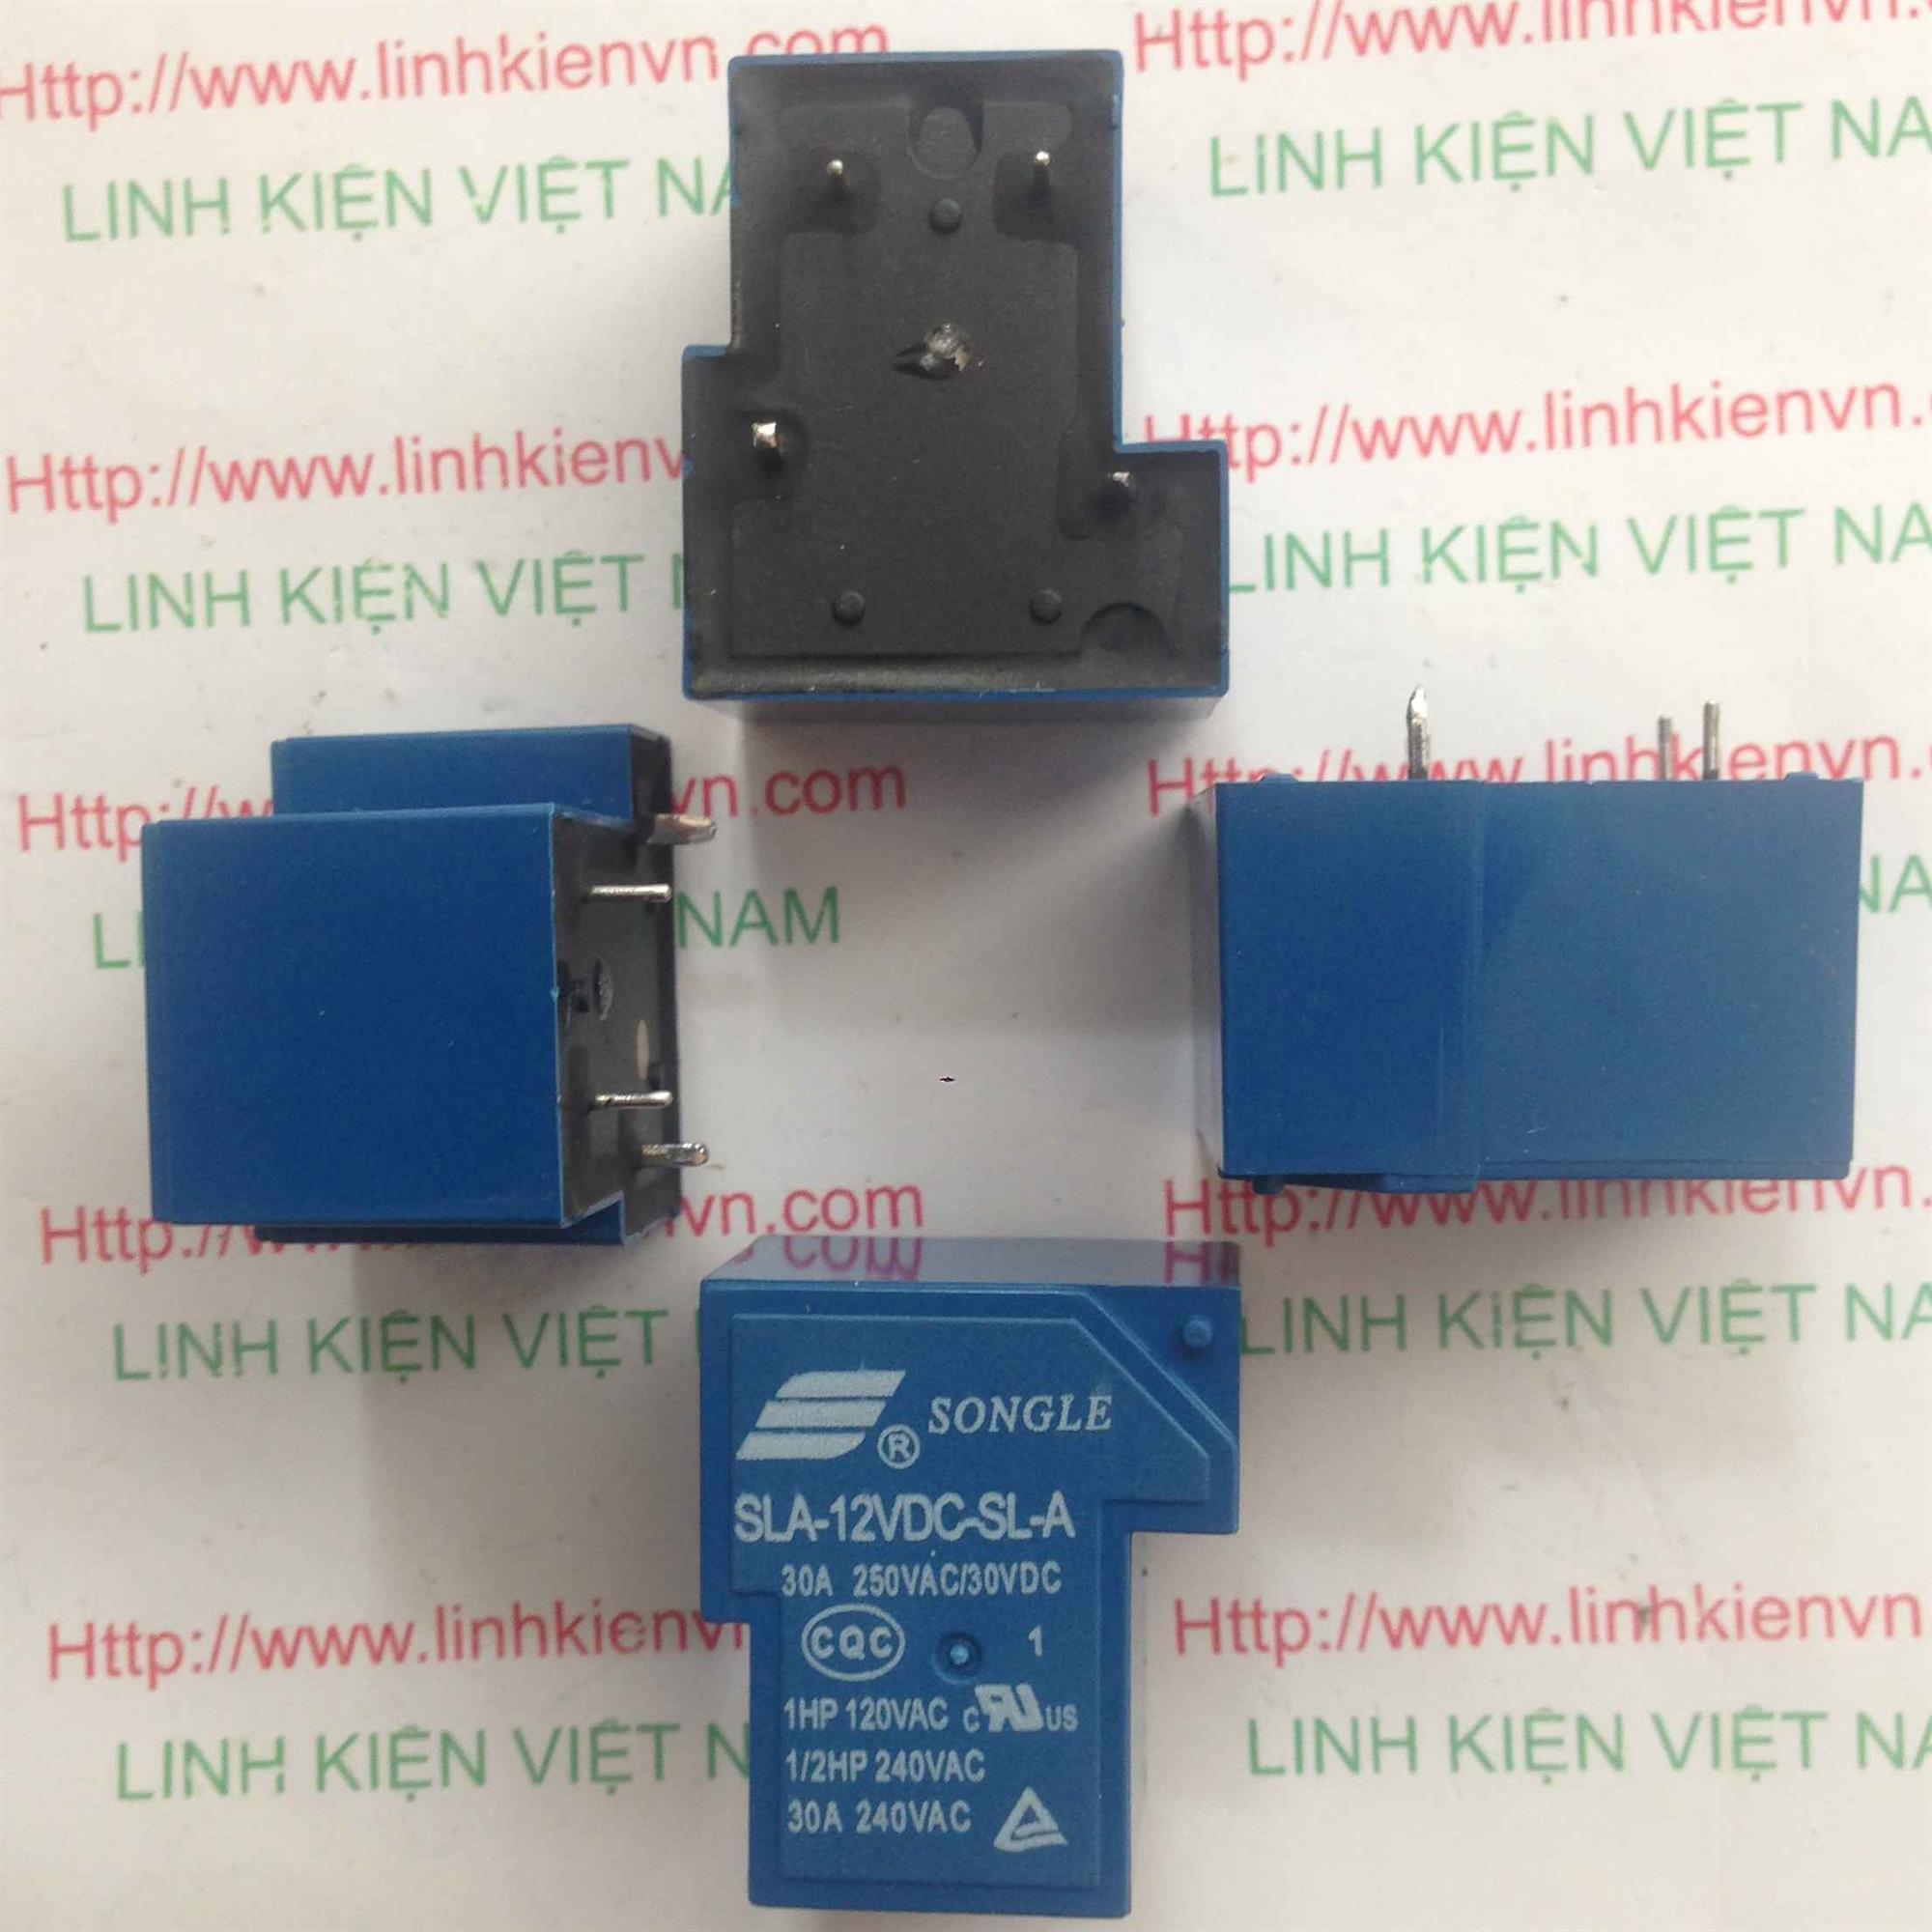 Relay 24V 30A 220V | SLA-24VDC-SL-A - A1H16(KB4H3)